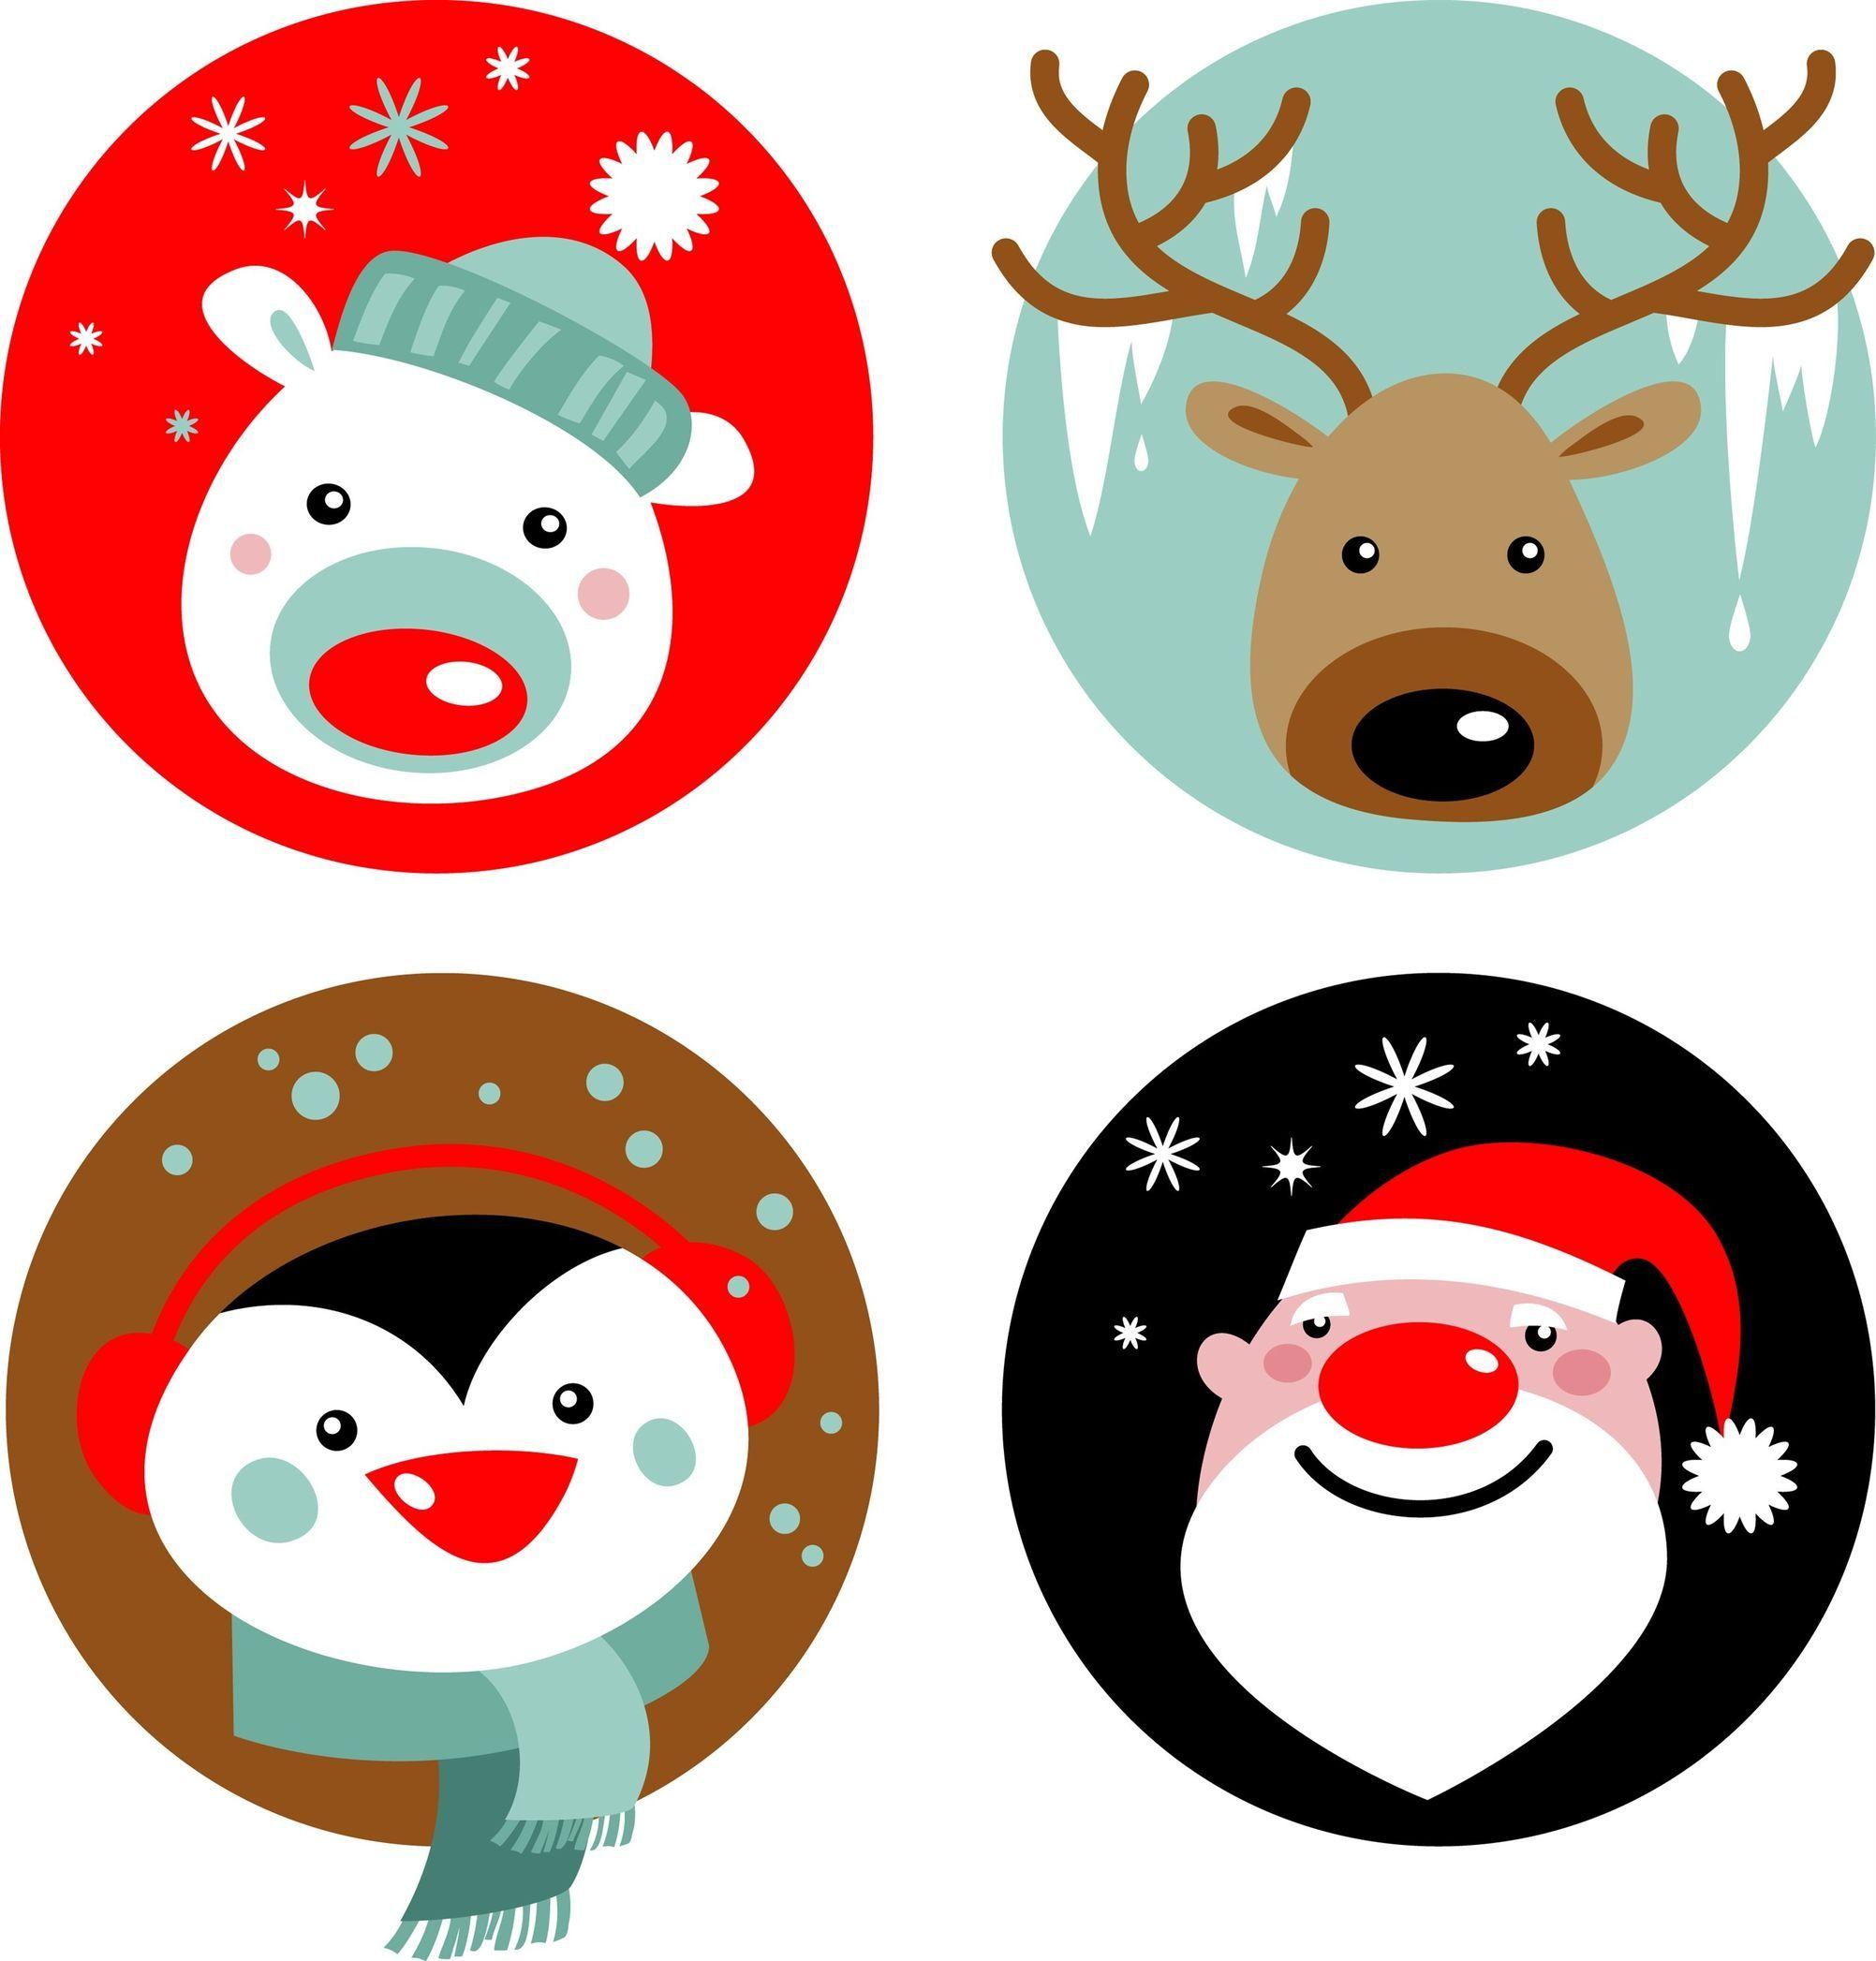 Christmas Dibujos De Navidad Para Imprimir Tarjetas De Navidad Para Imprimir Etiquetas Navideñas